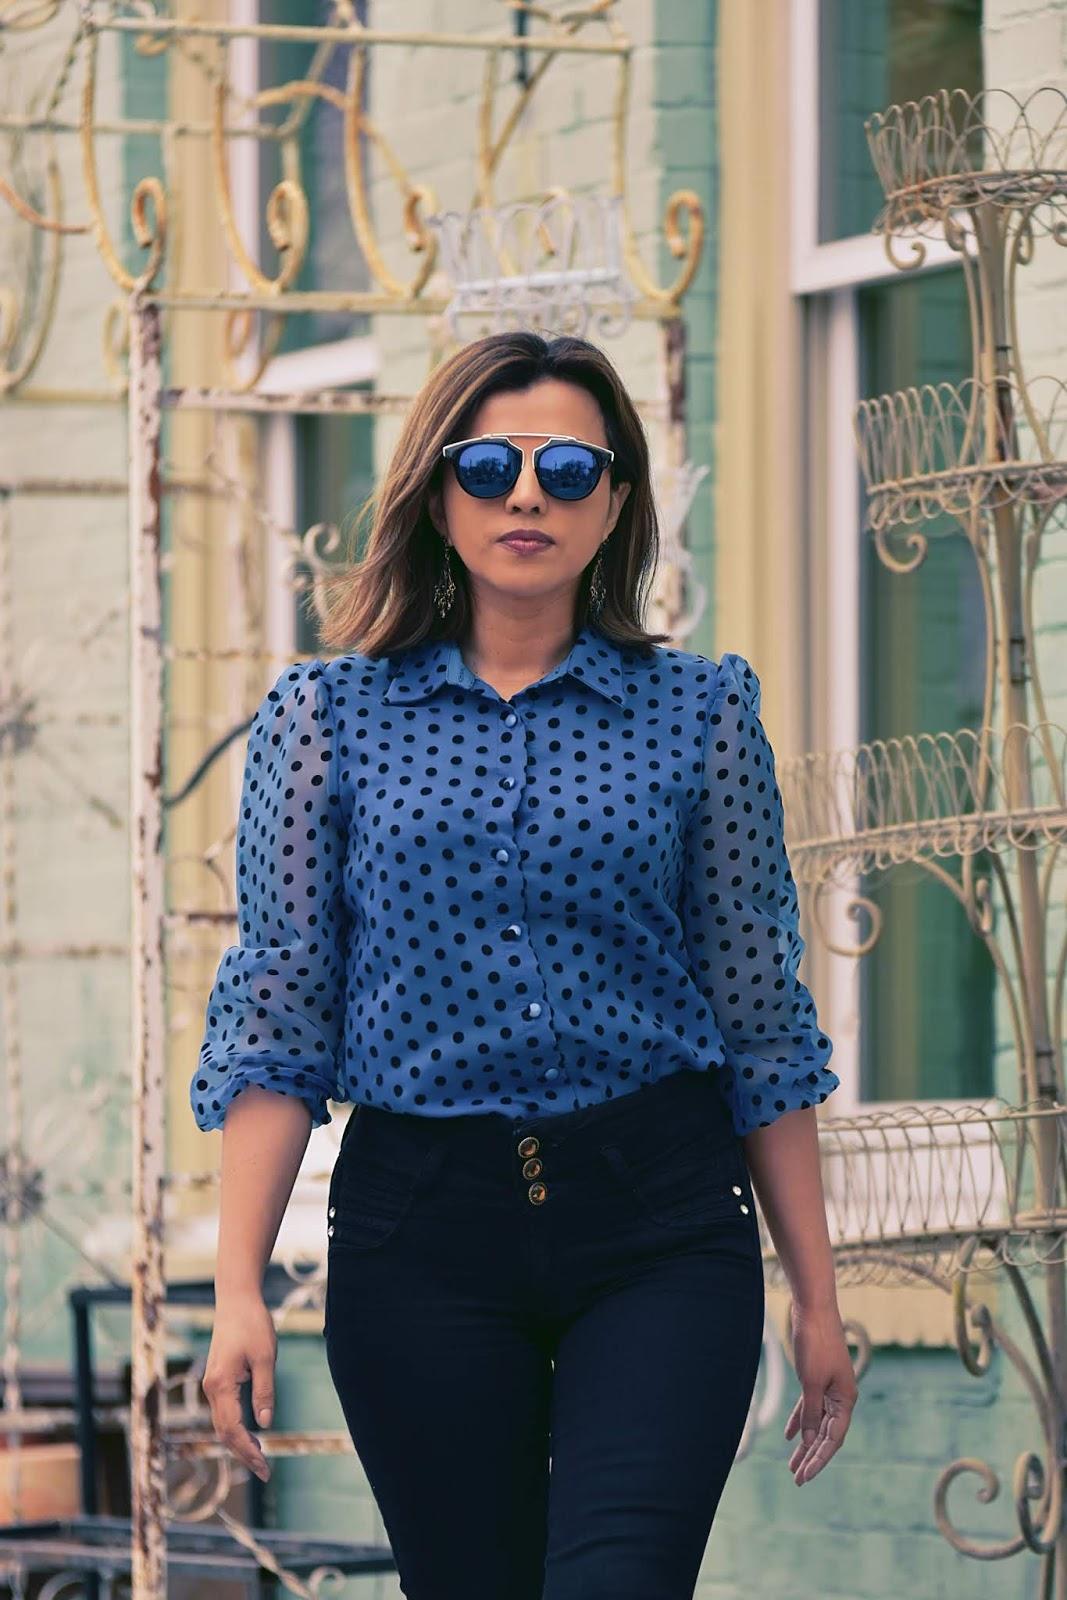 Polka Dots En Primavera-MariEstilo-LuxeGal-Fashion-StreetStyle-look of the day-dcblogger-marisolflamenco-armandhugon-blogger de moda-it girl-